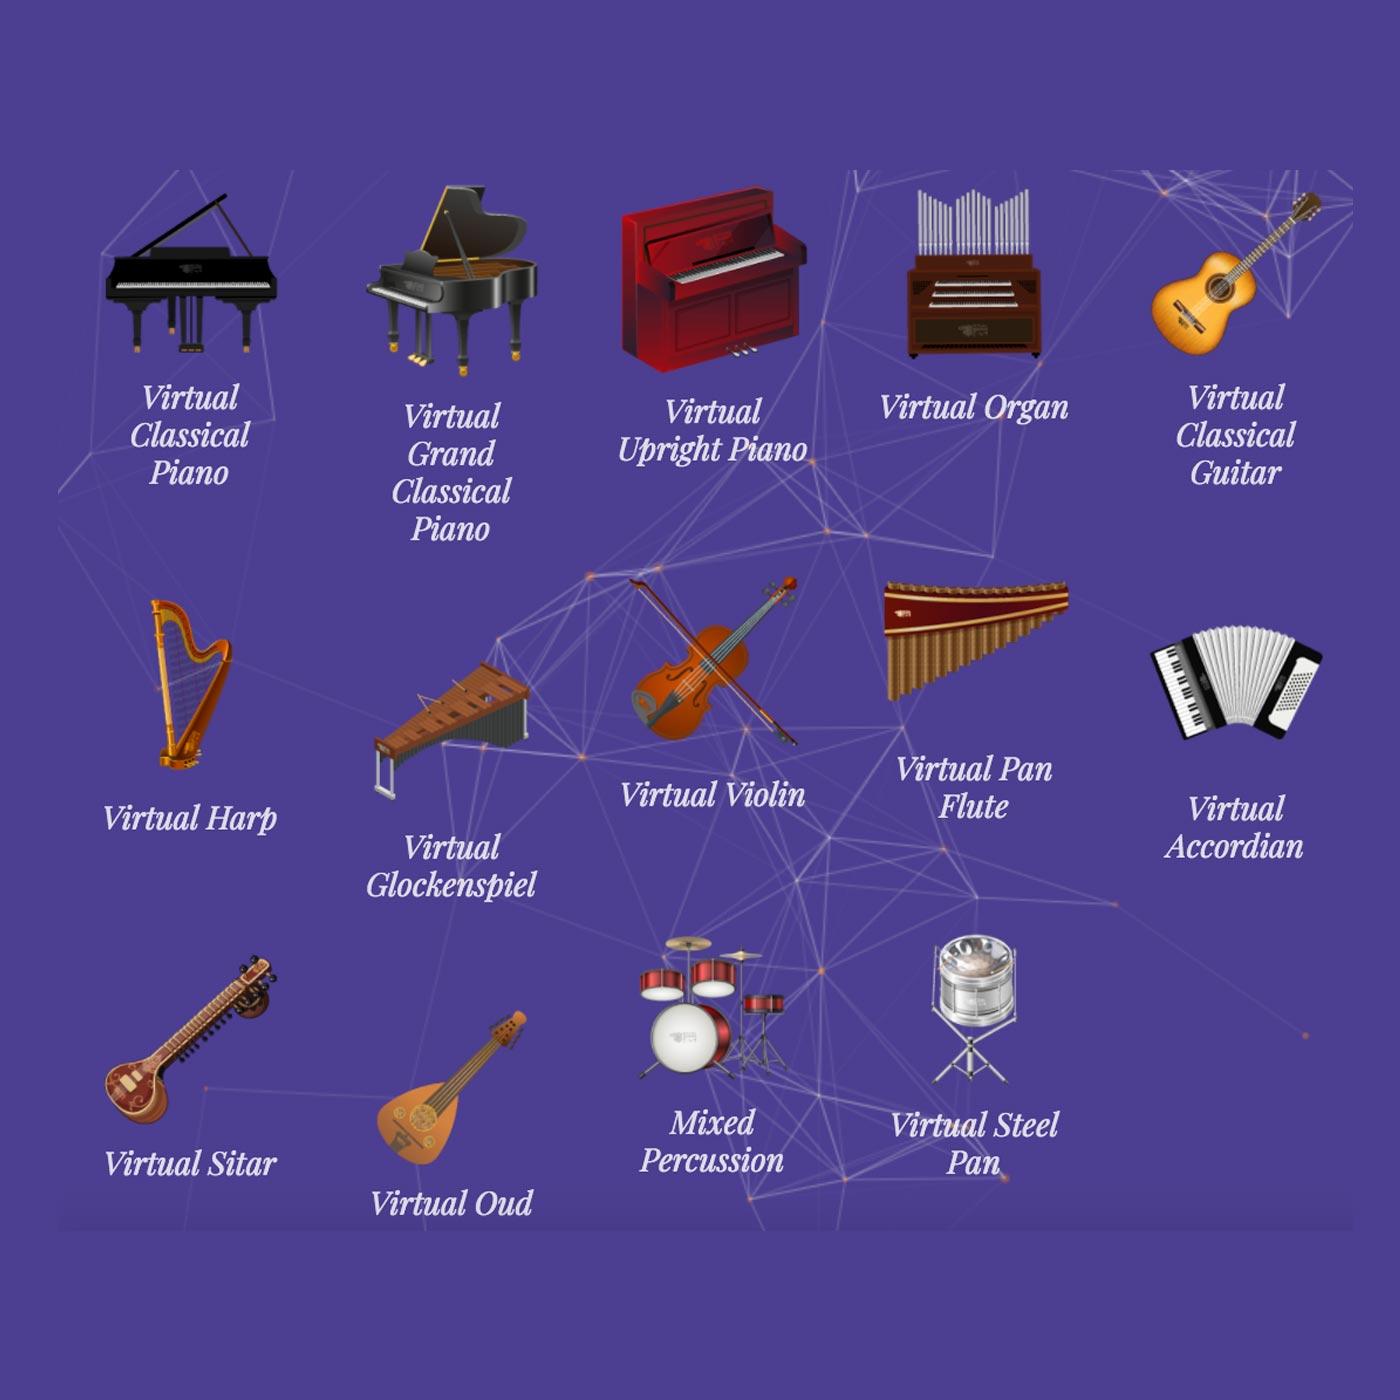 Virtual Music Instruments, Virtual Piano